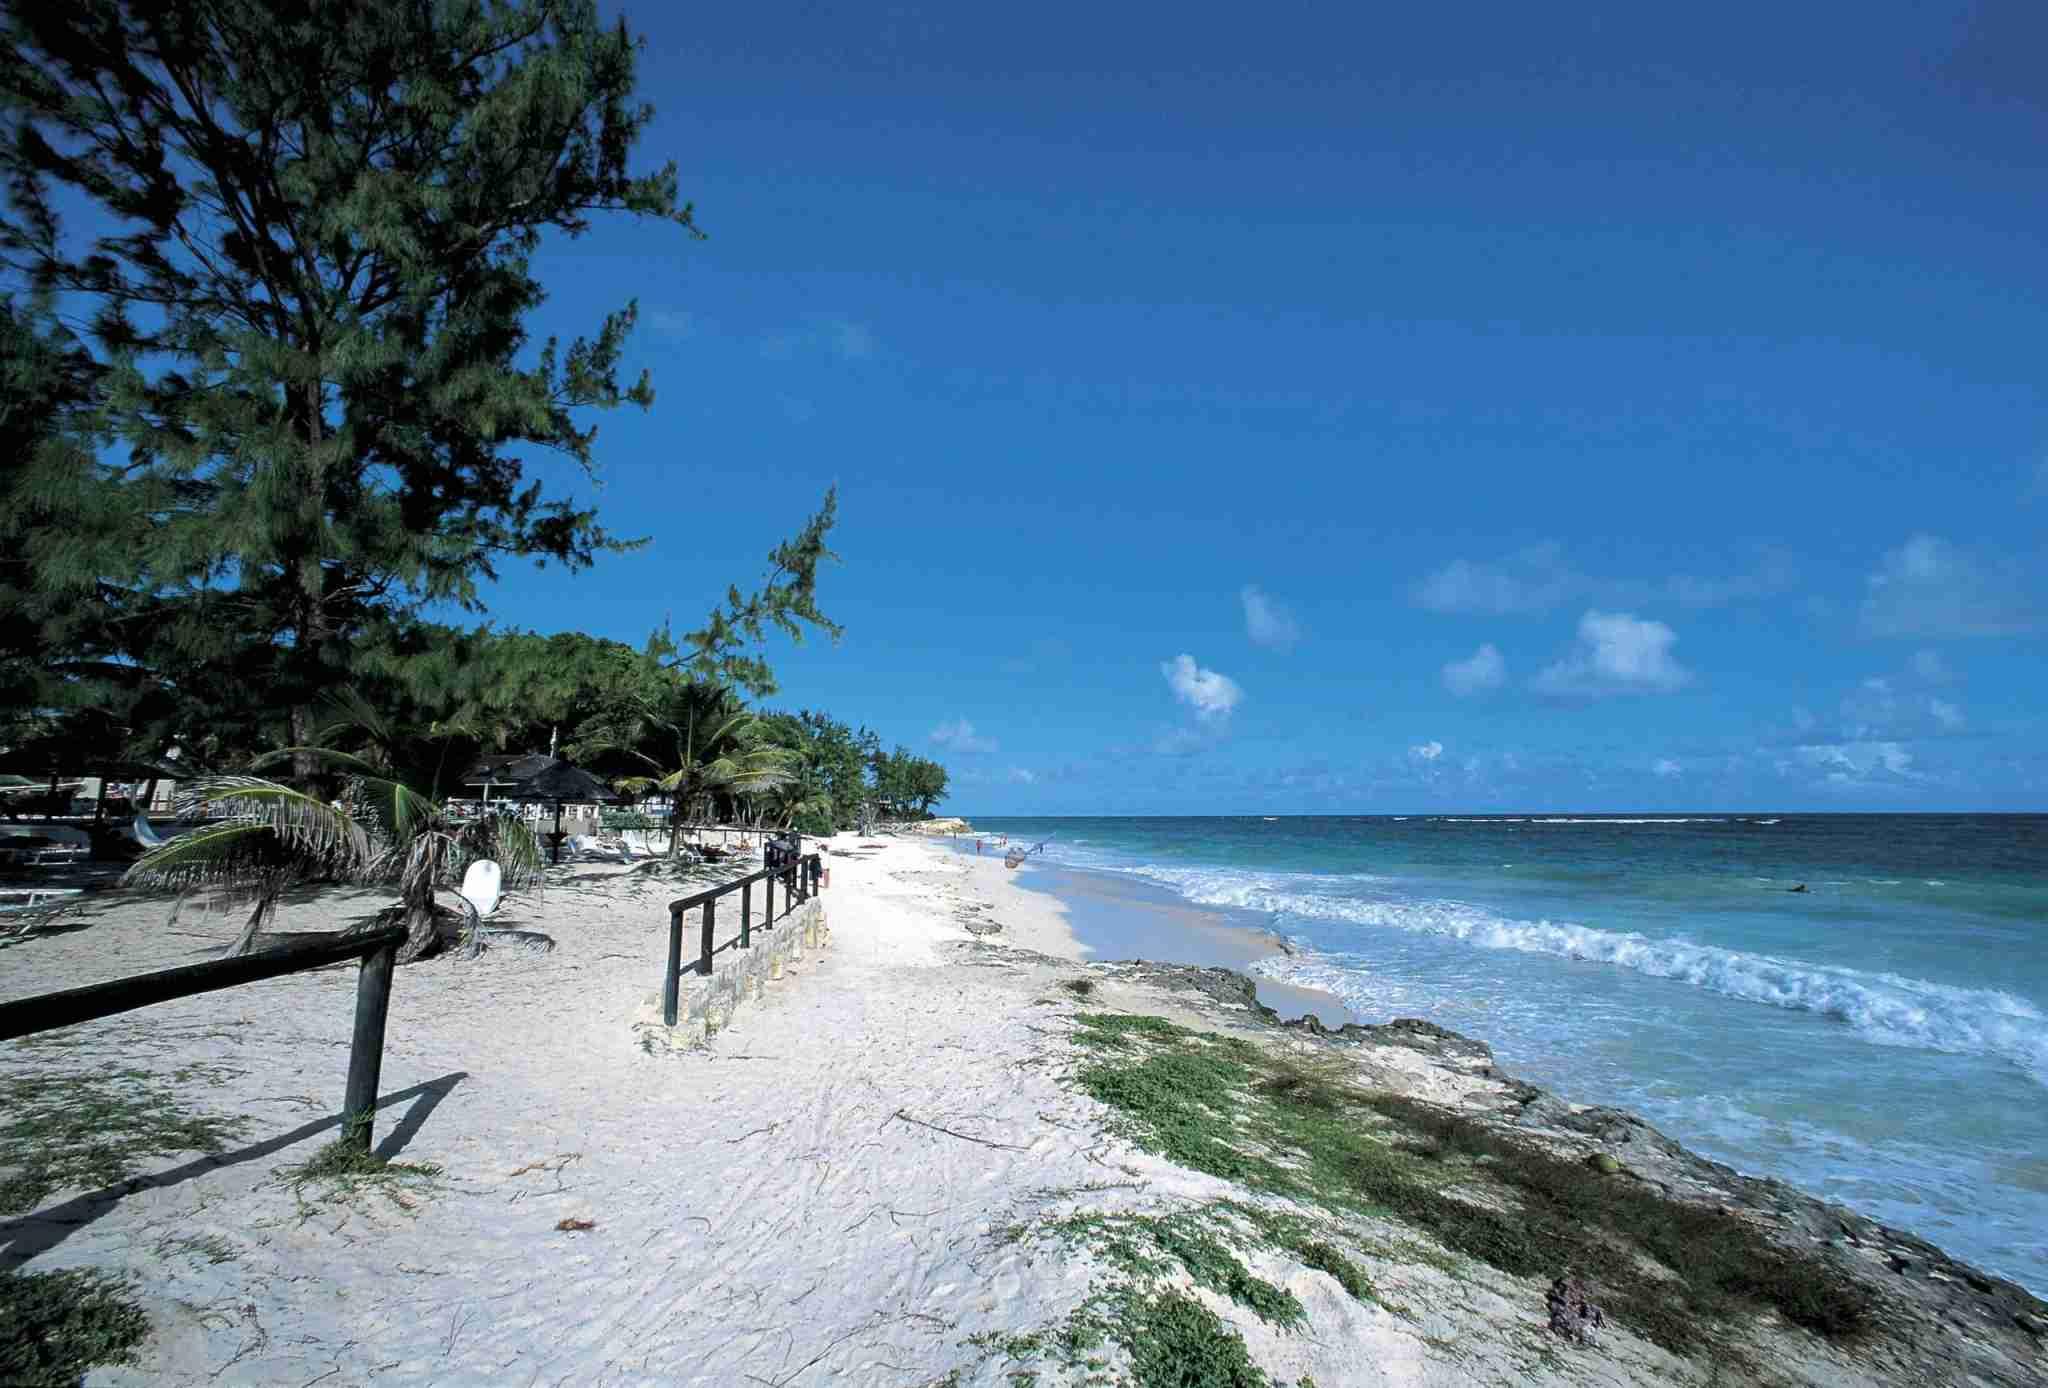 Silver Sand Bay, Christ Church Parish, Barbados. (Photo by DEA-S.-AMANTINI-Contributor Getty)